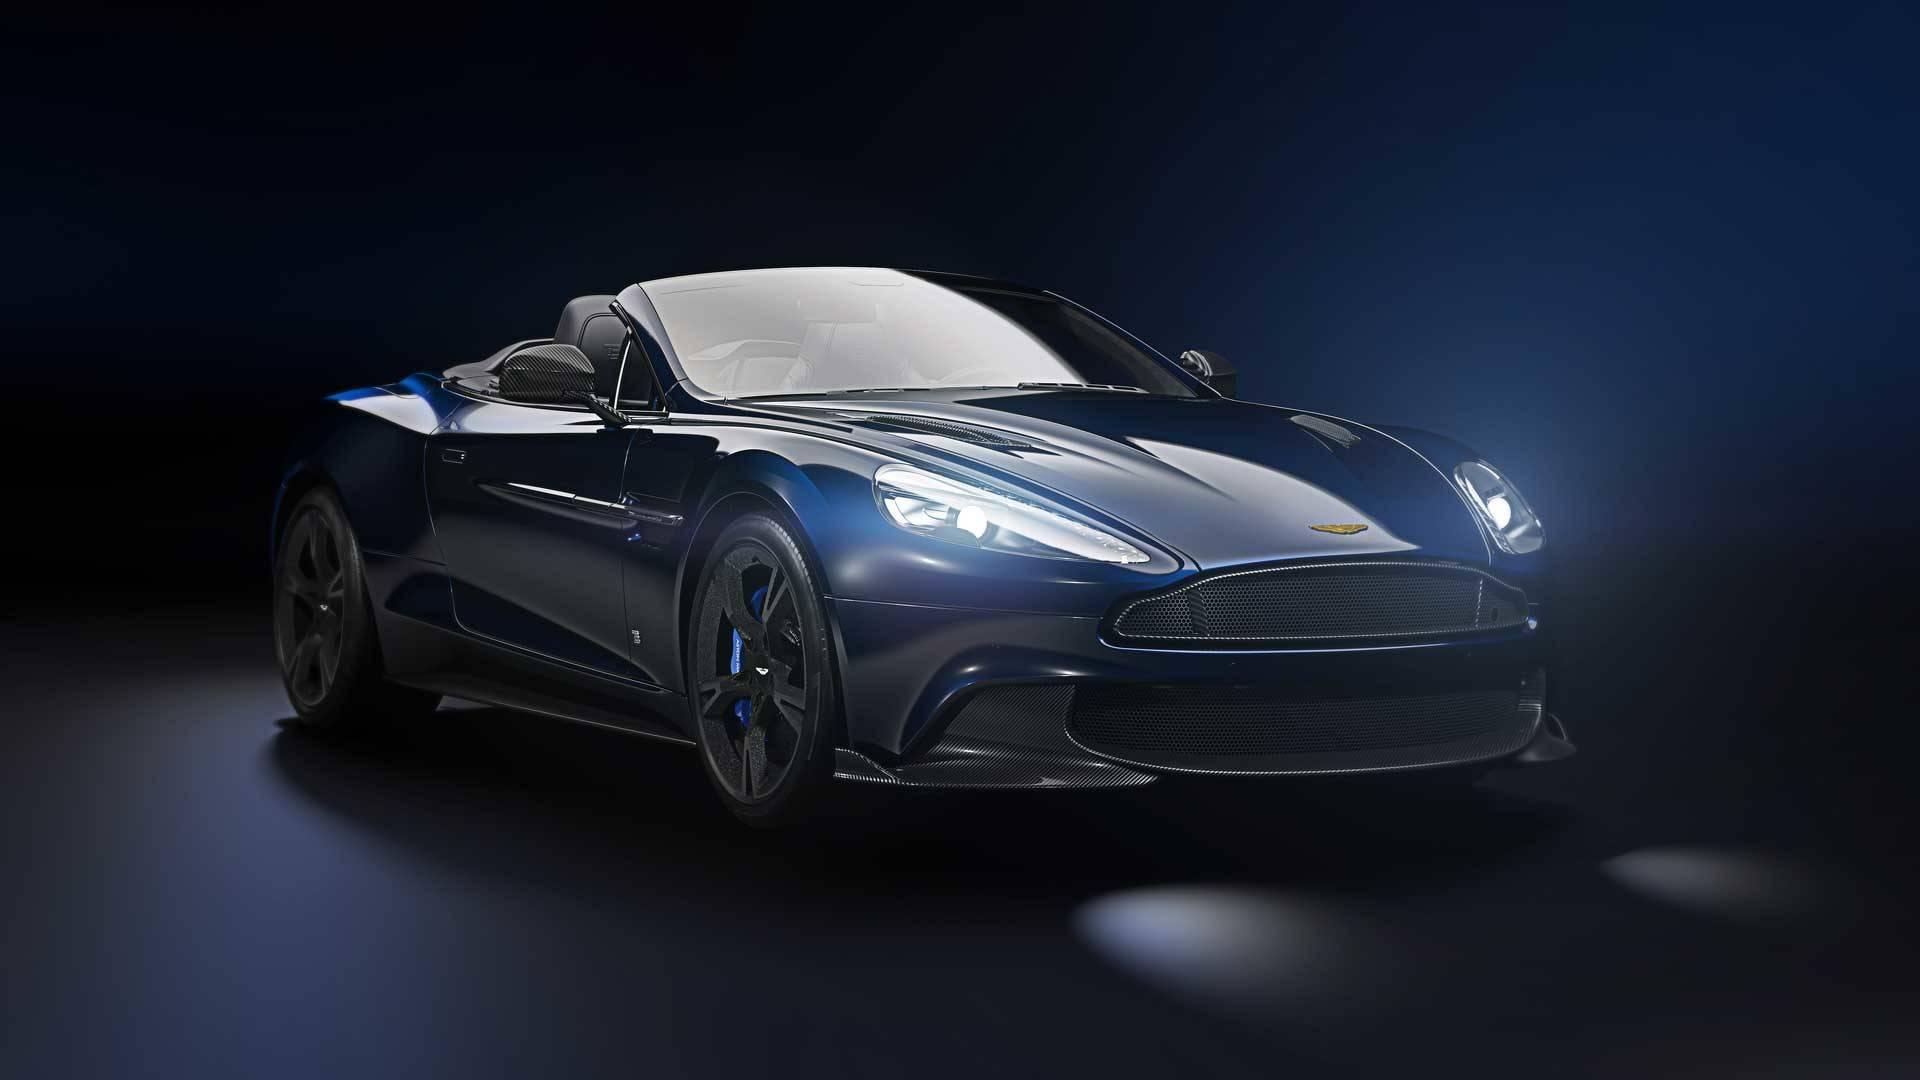 2018 Aston Martin Vanquish S Volante Tom Brady Signature Edition Namastecar